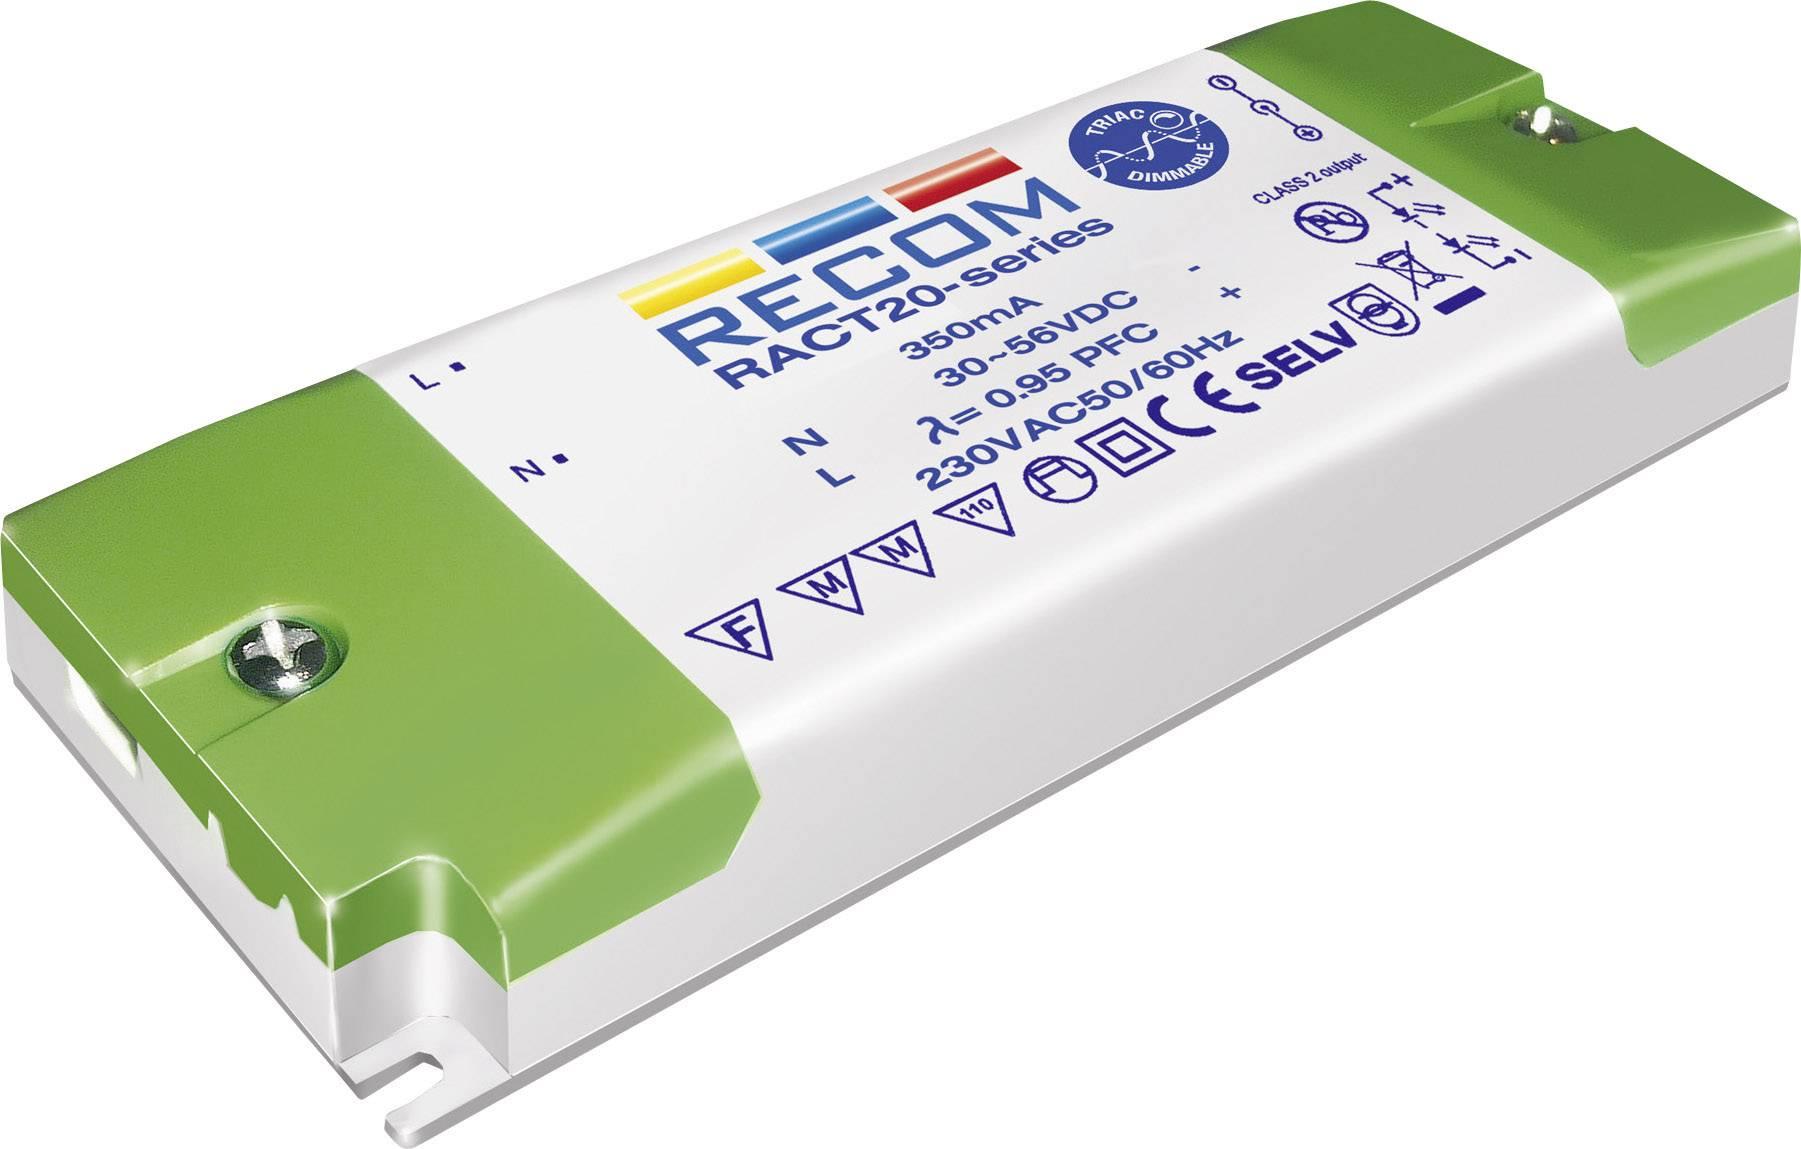 LED driver Recom Lighting RACT20-500, 20 W (max), 0.5 A, 21 - 39 V/DC